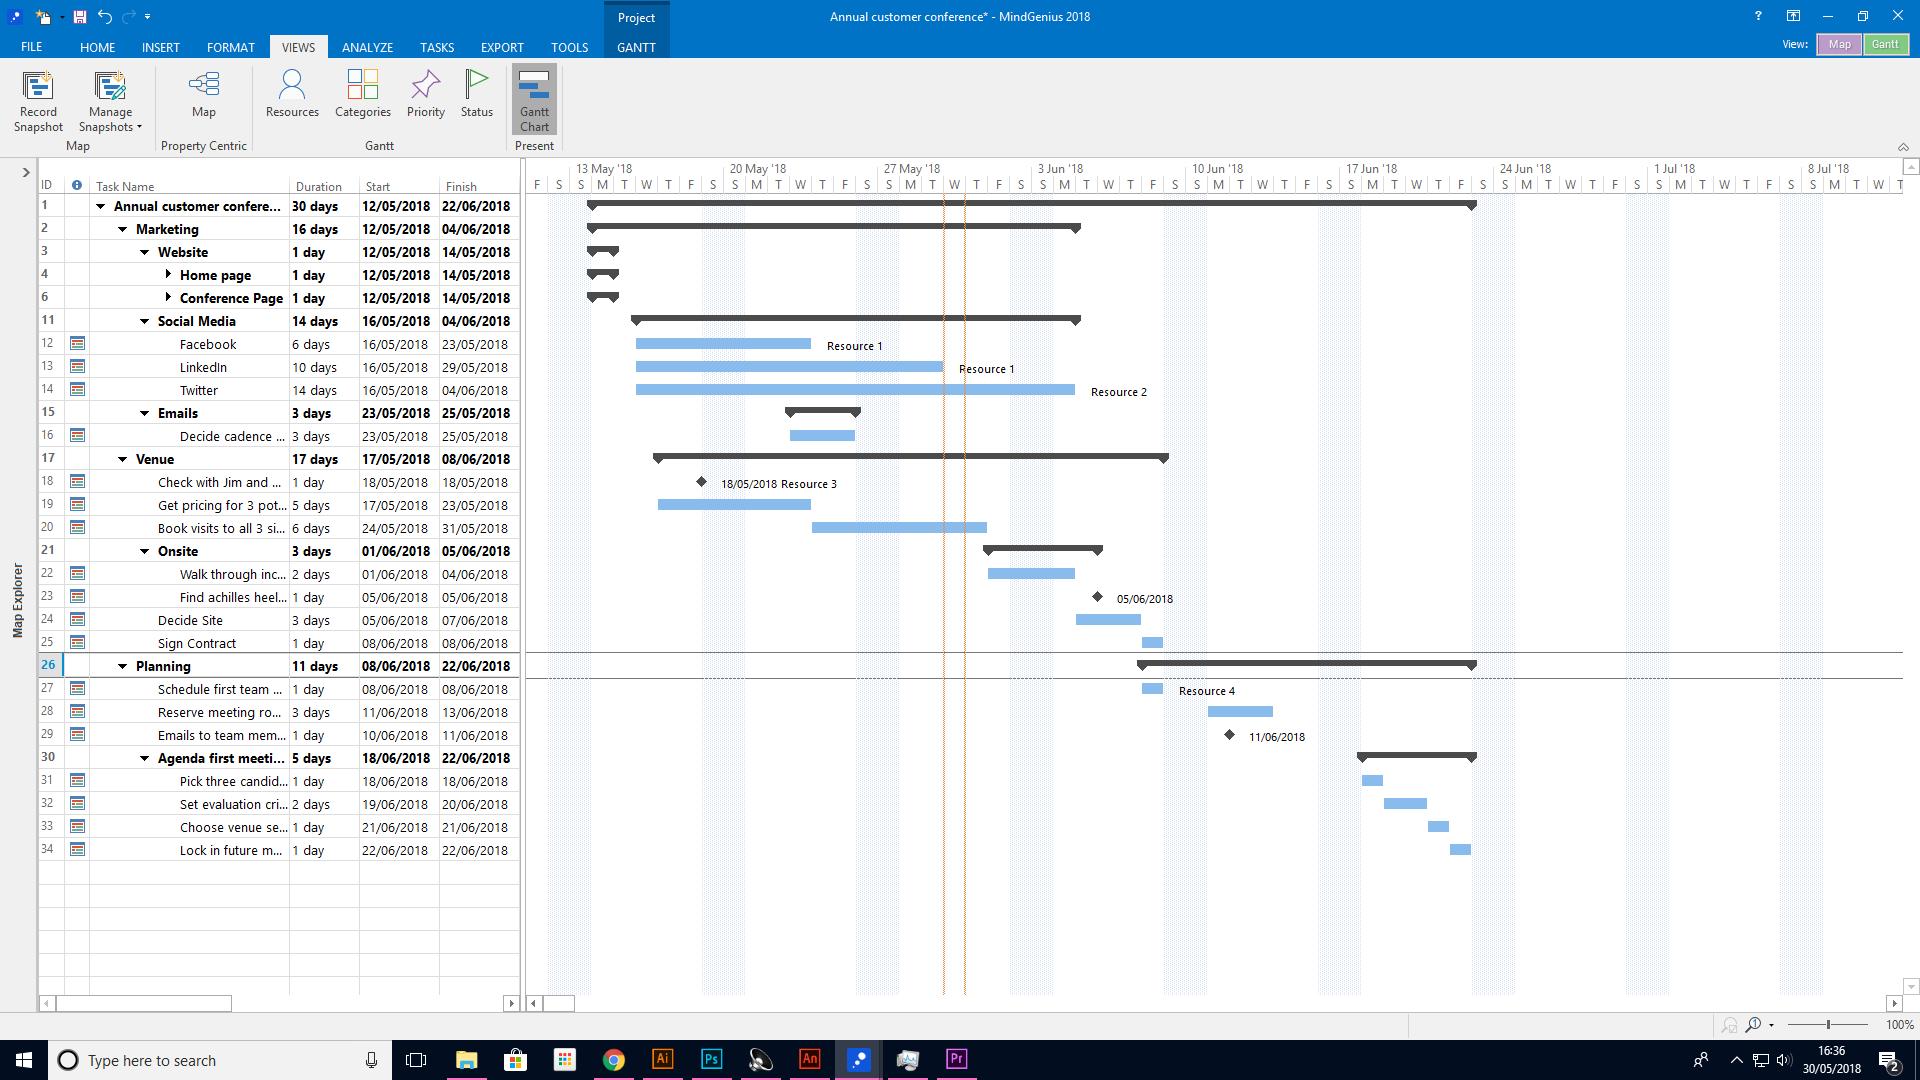 MindGenius Software - Gantt chart